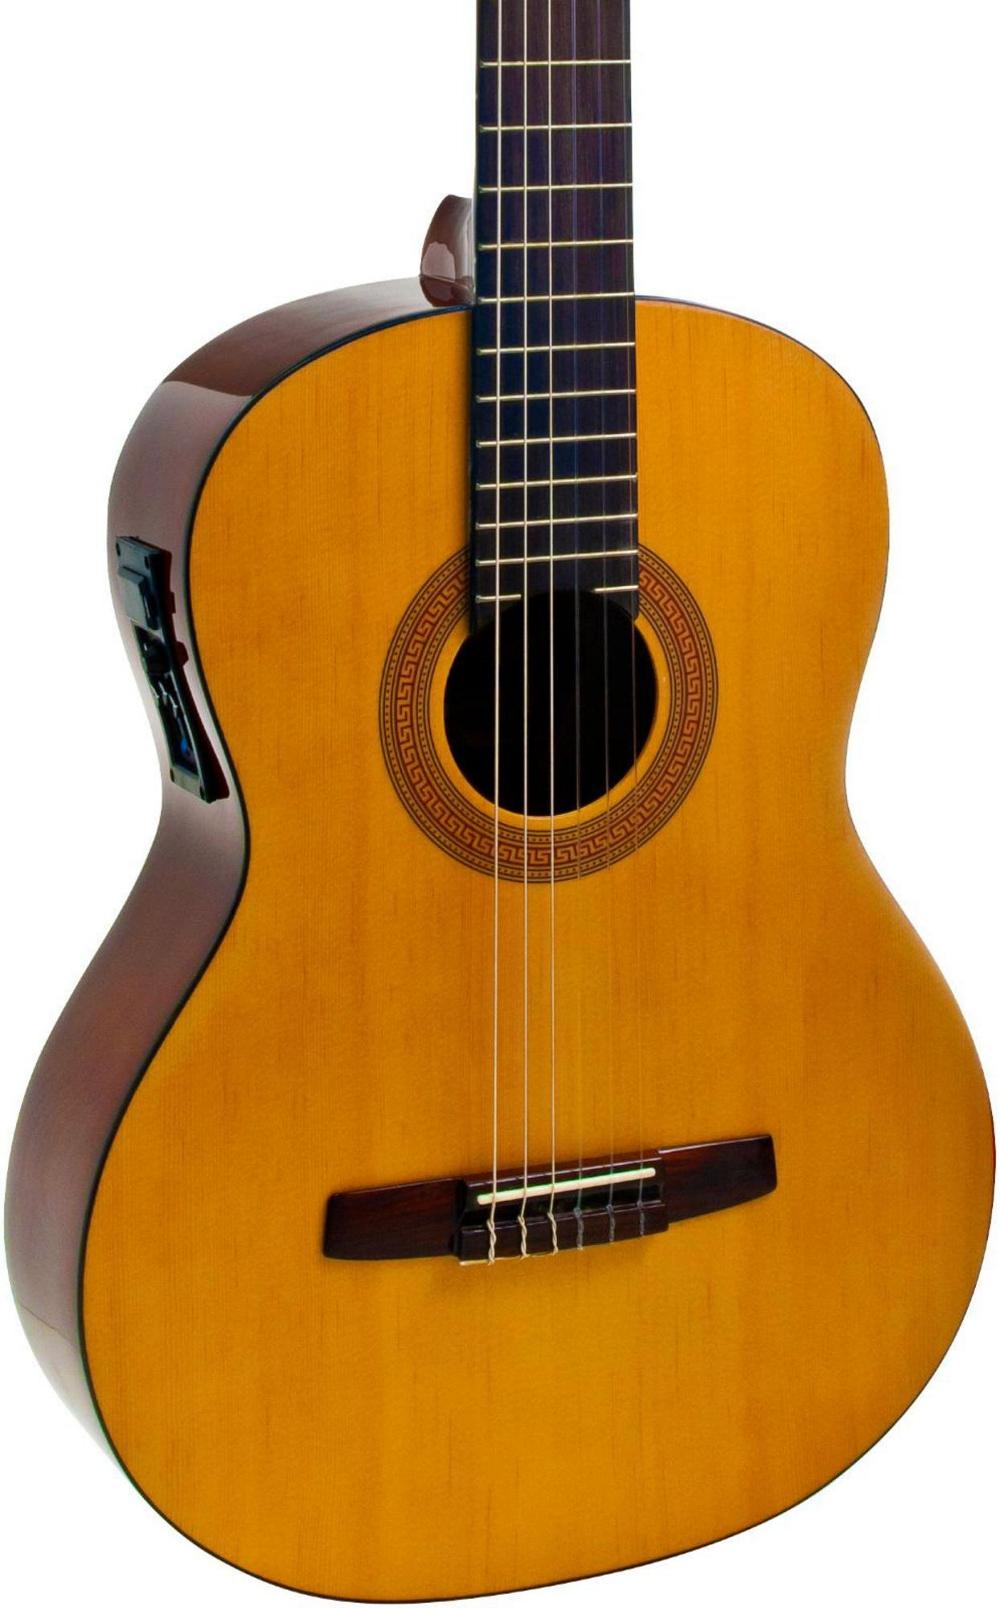 hohner a full size nylon string acoustic electric guitar natural ebay. Black Bedroom Furniture Sets. Home Design Ideas